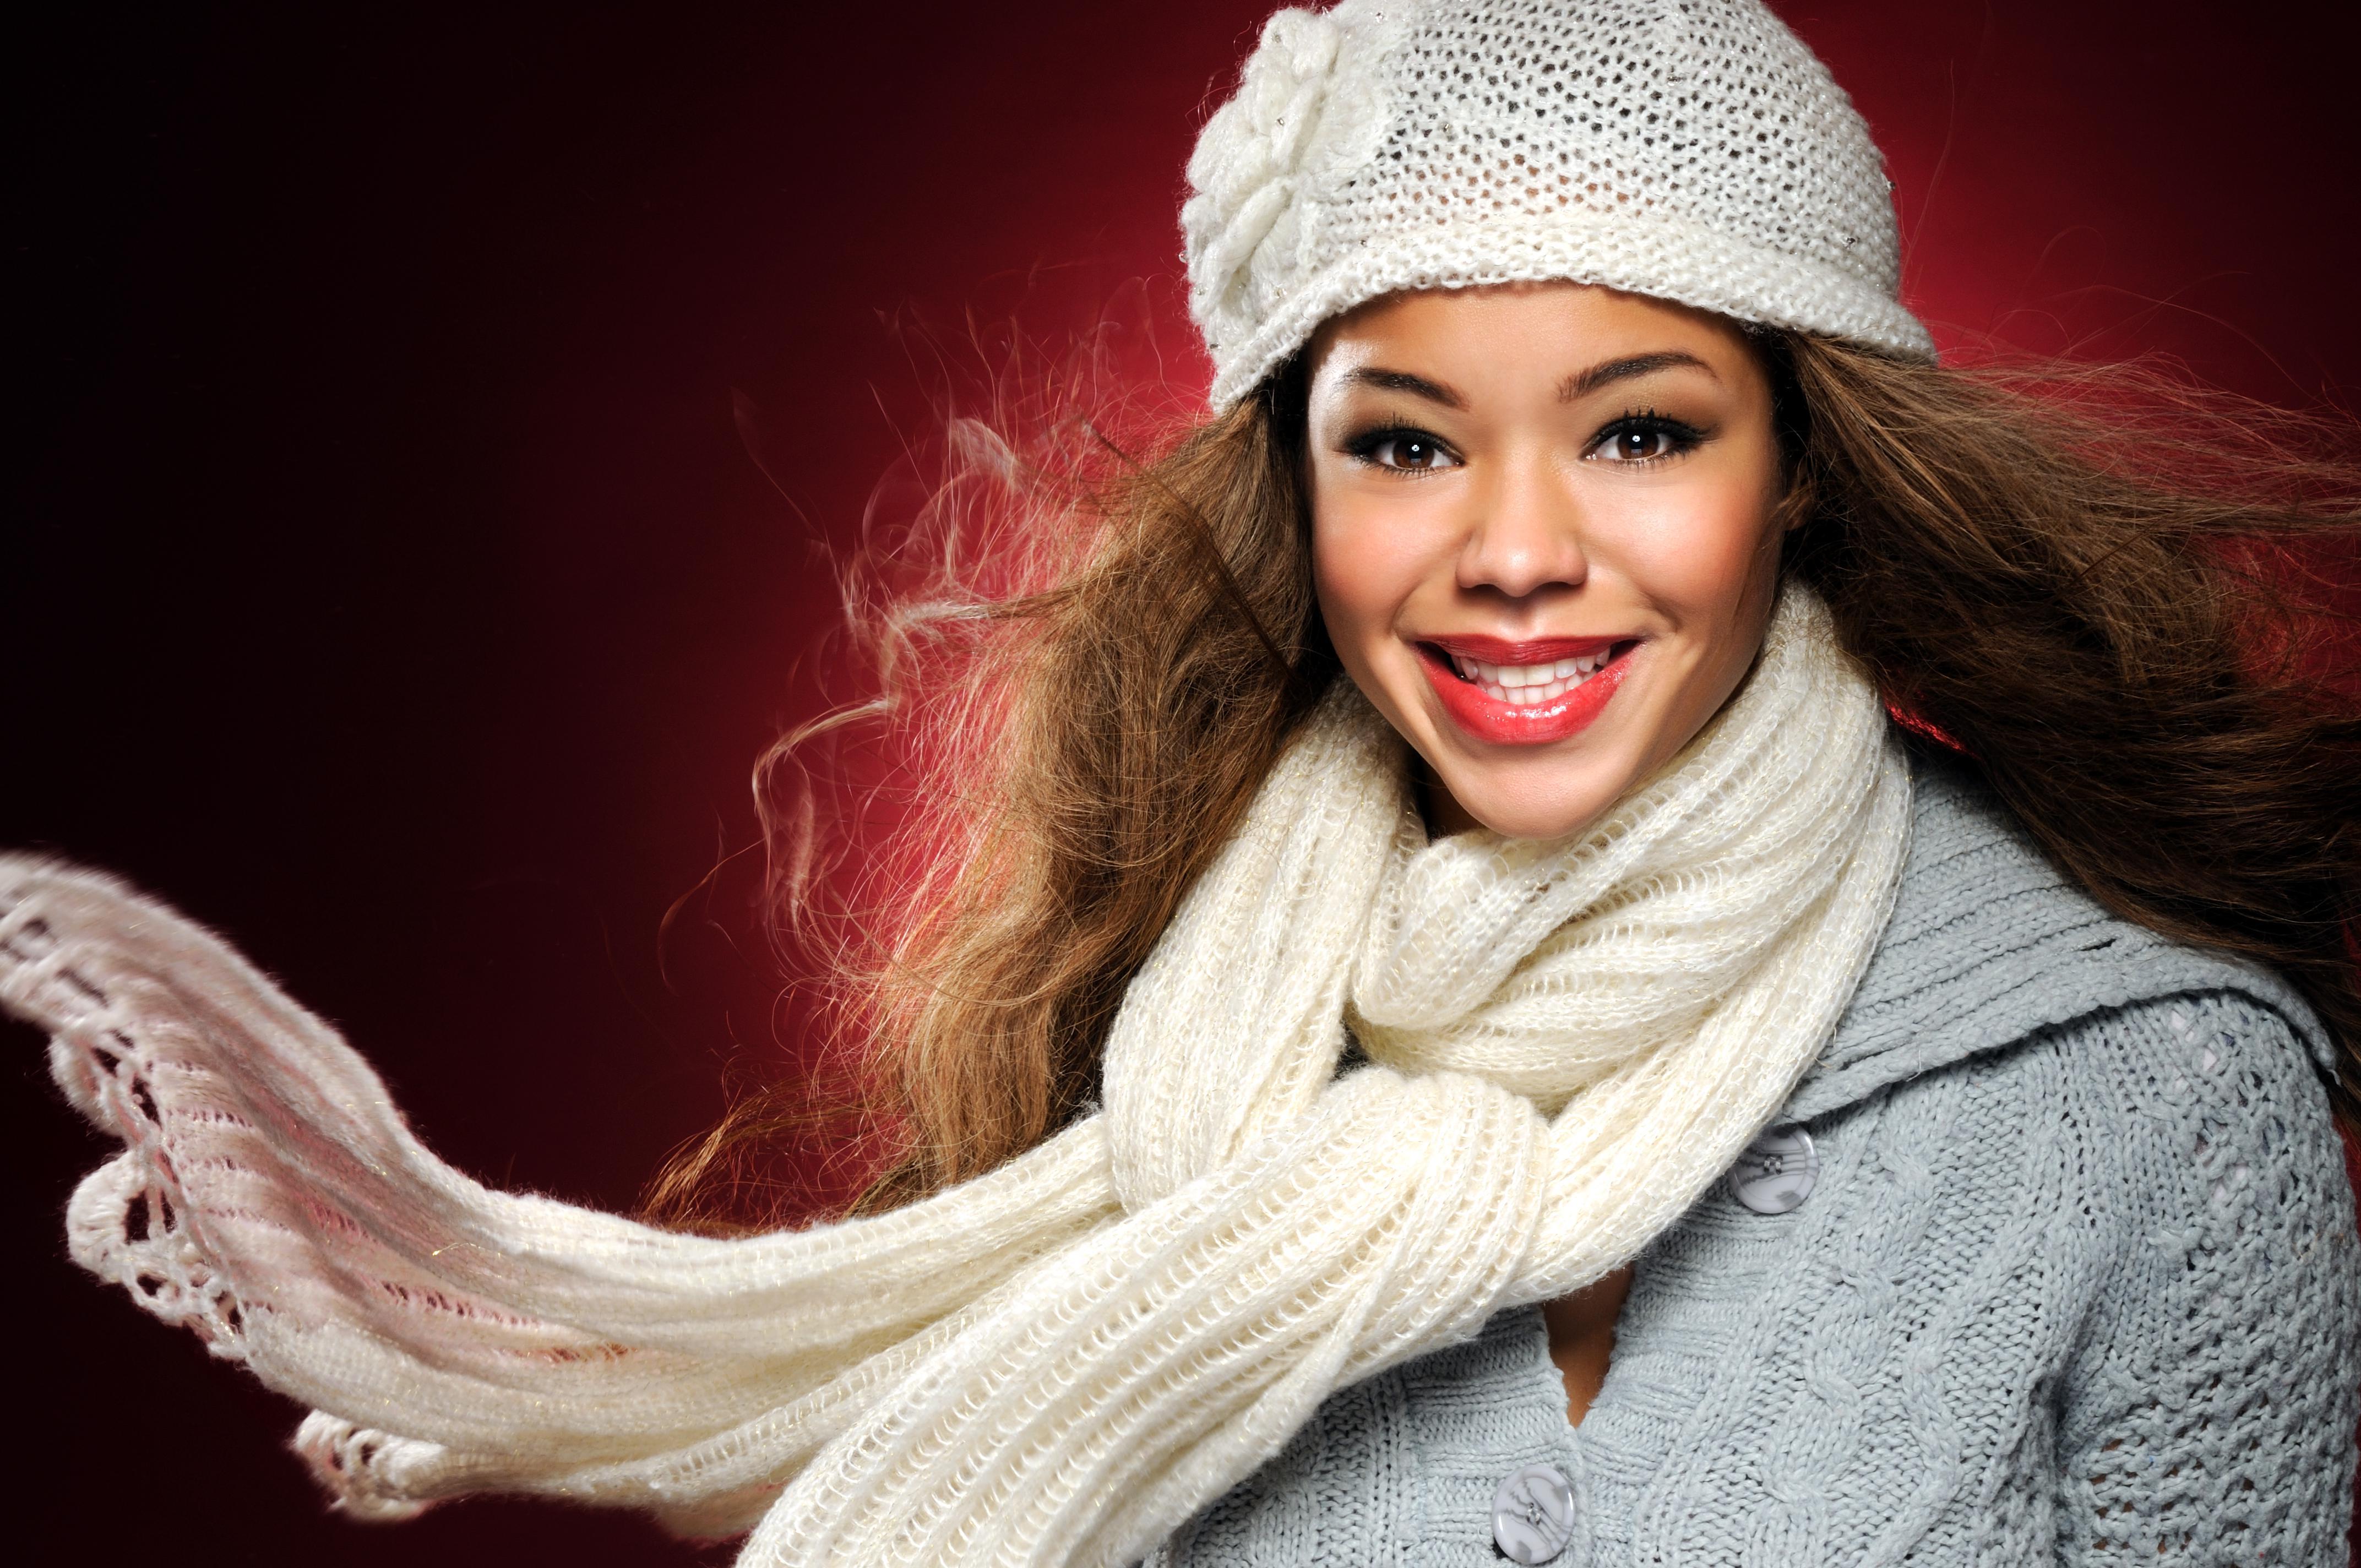 Cheerful Winter Beauty